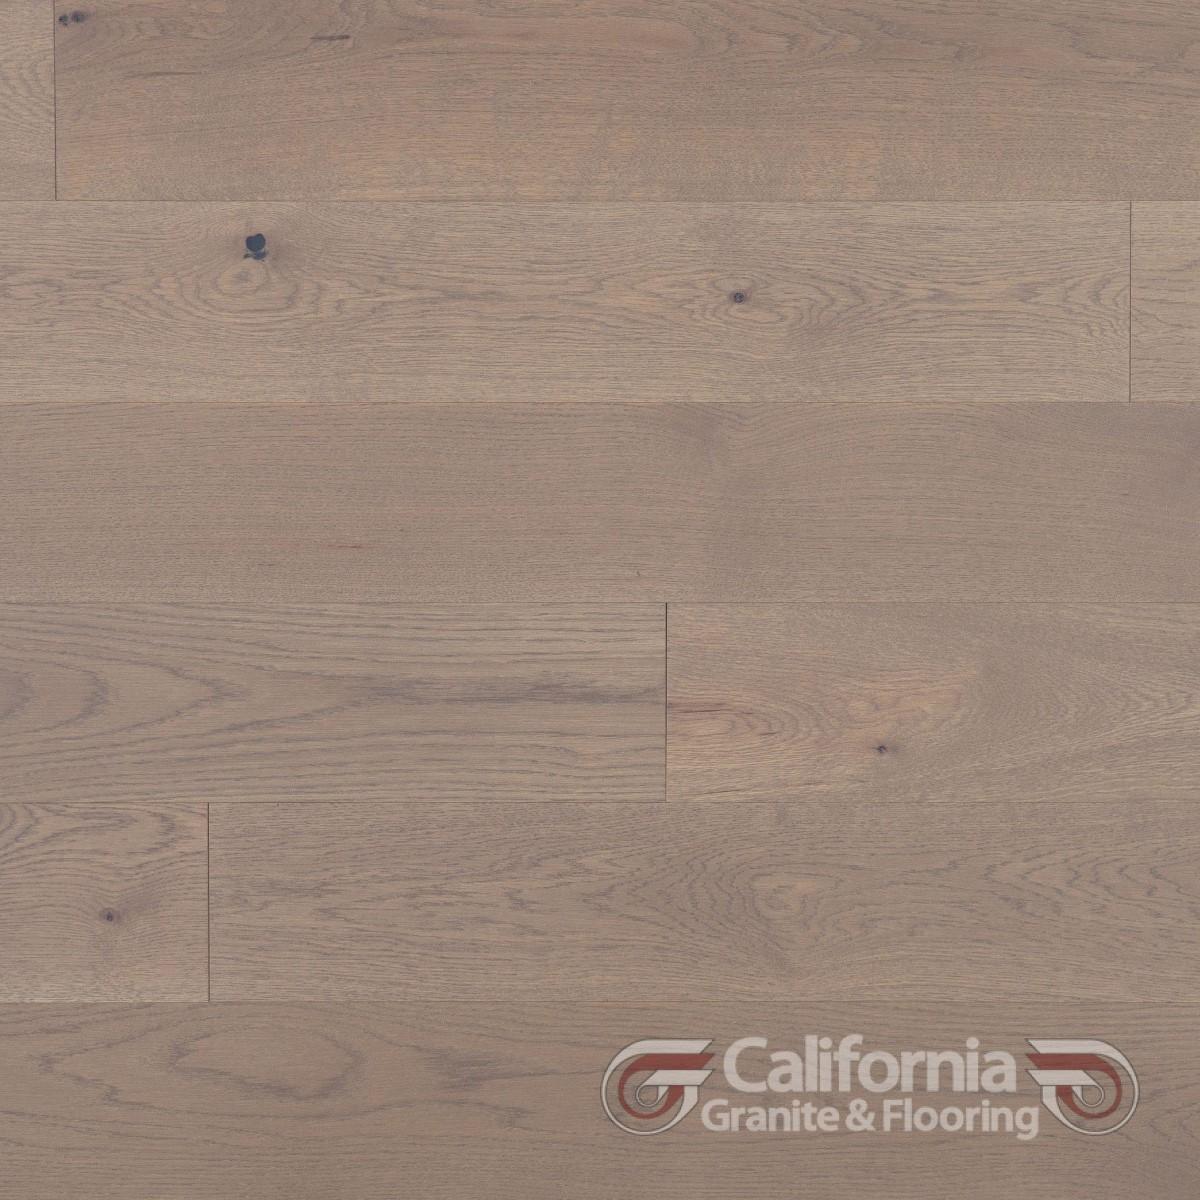 hardwood-flooring-white-oak-sand-dune-character-brushed-herringbone-2